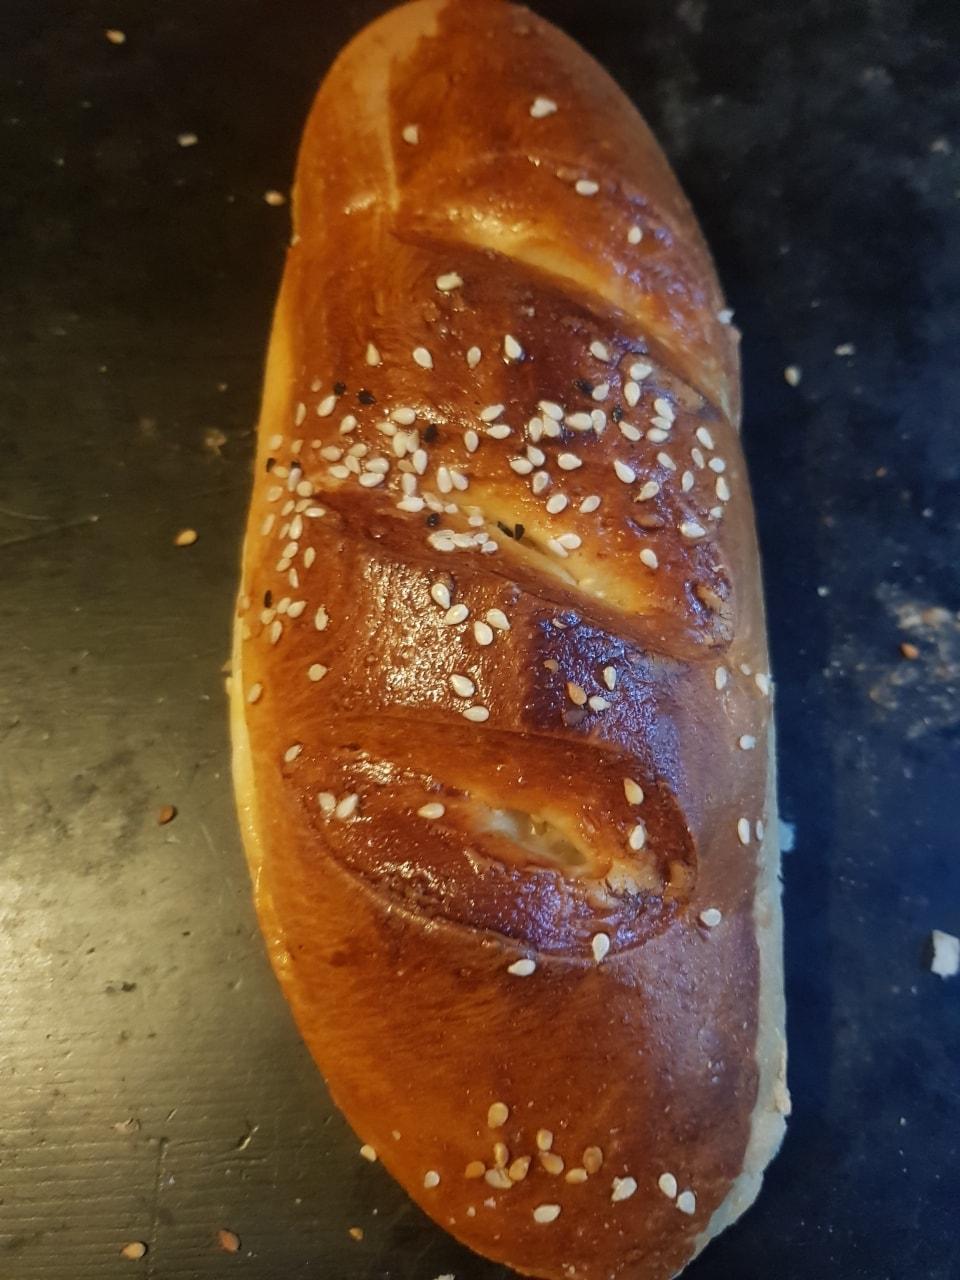 Sausage roll / hot dog pogoca